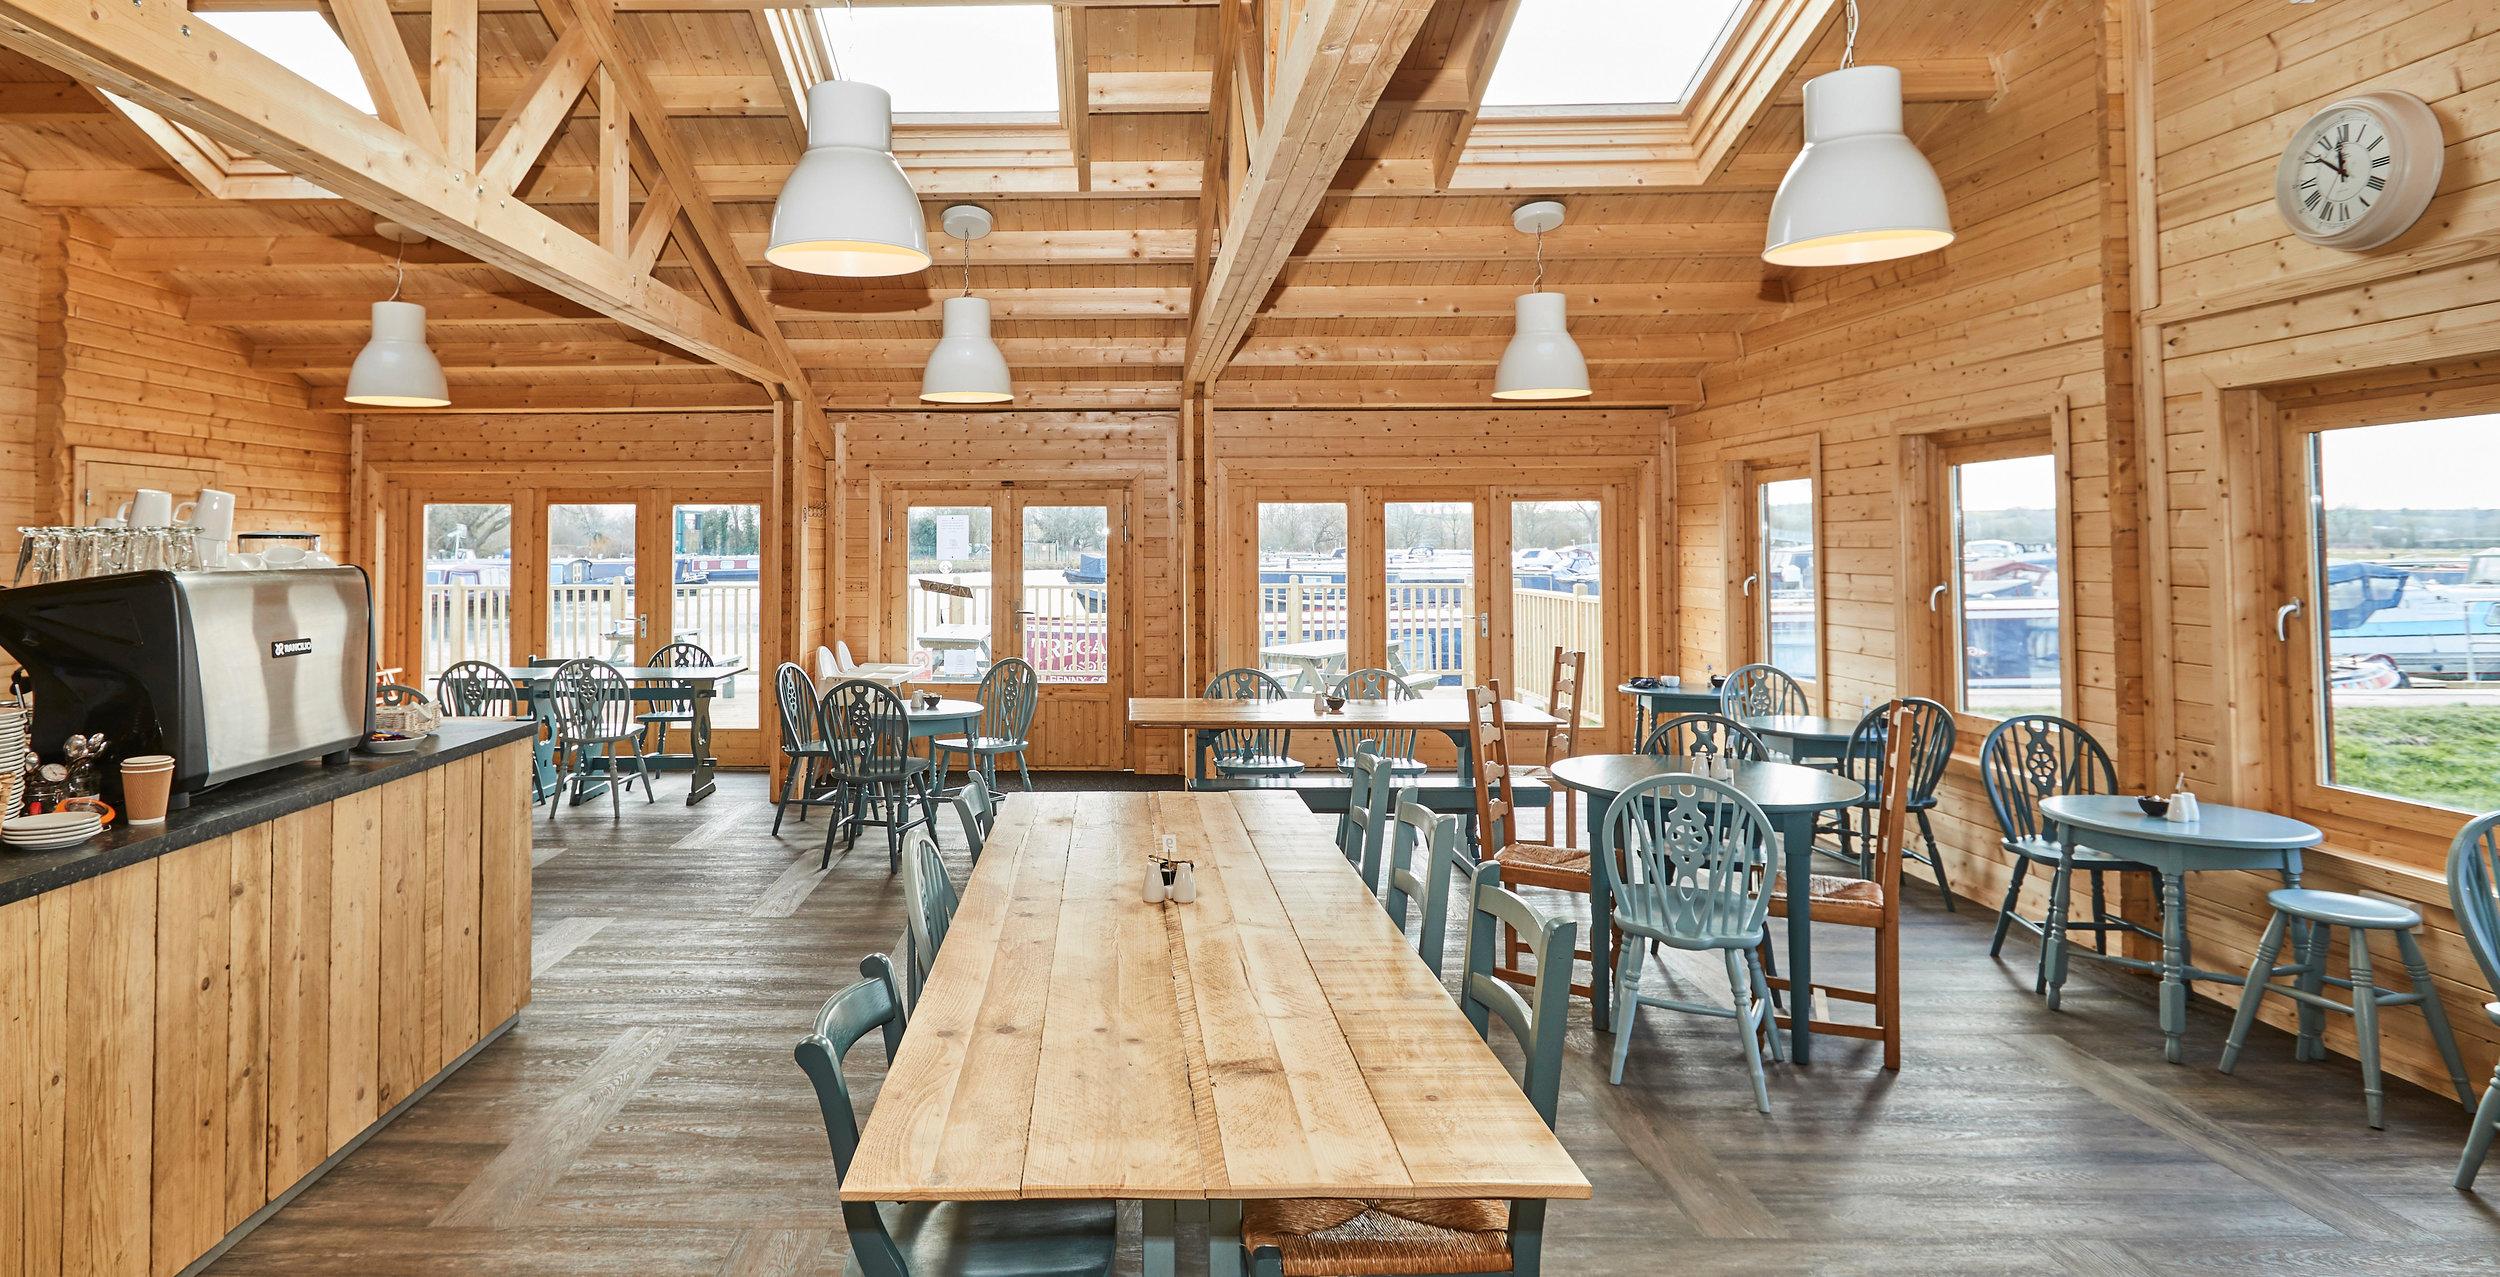 theb_boathouse_cafe_white_mills_marina_river_nene_earls_barton